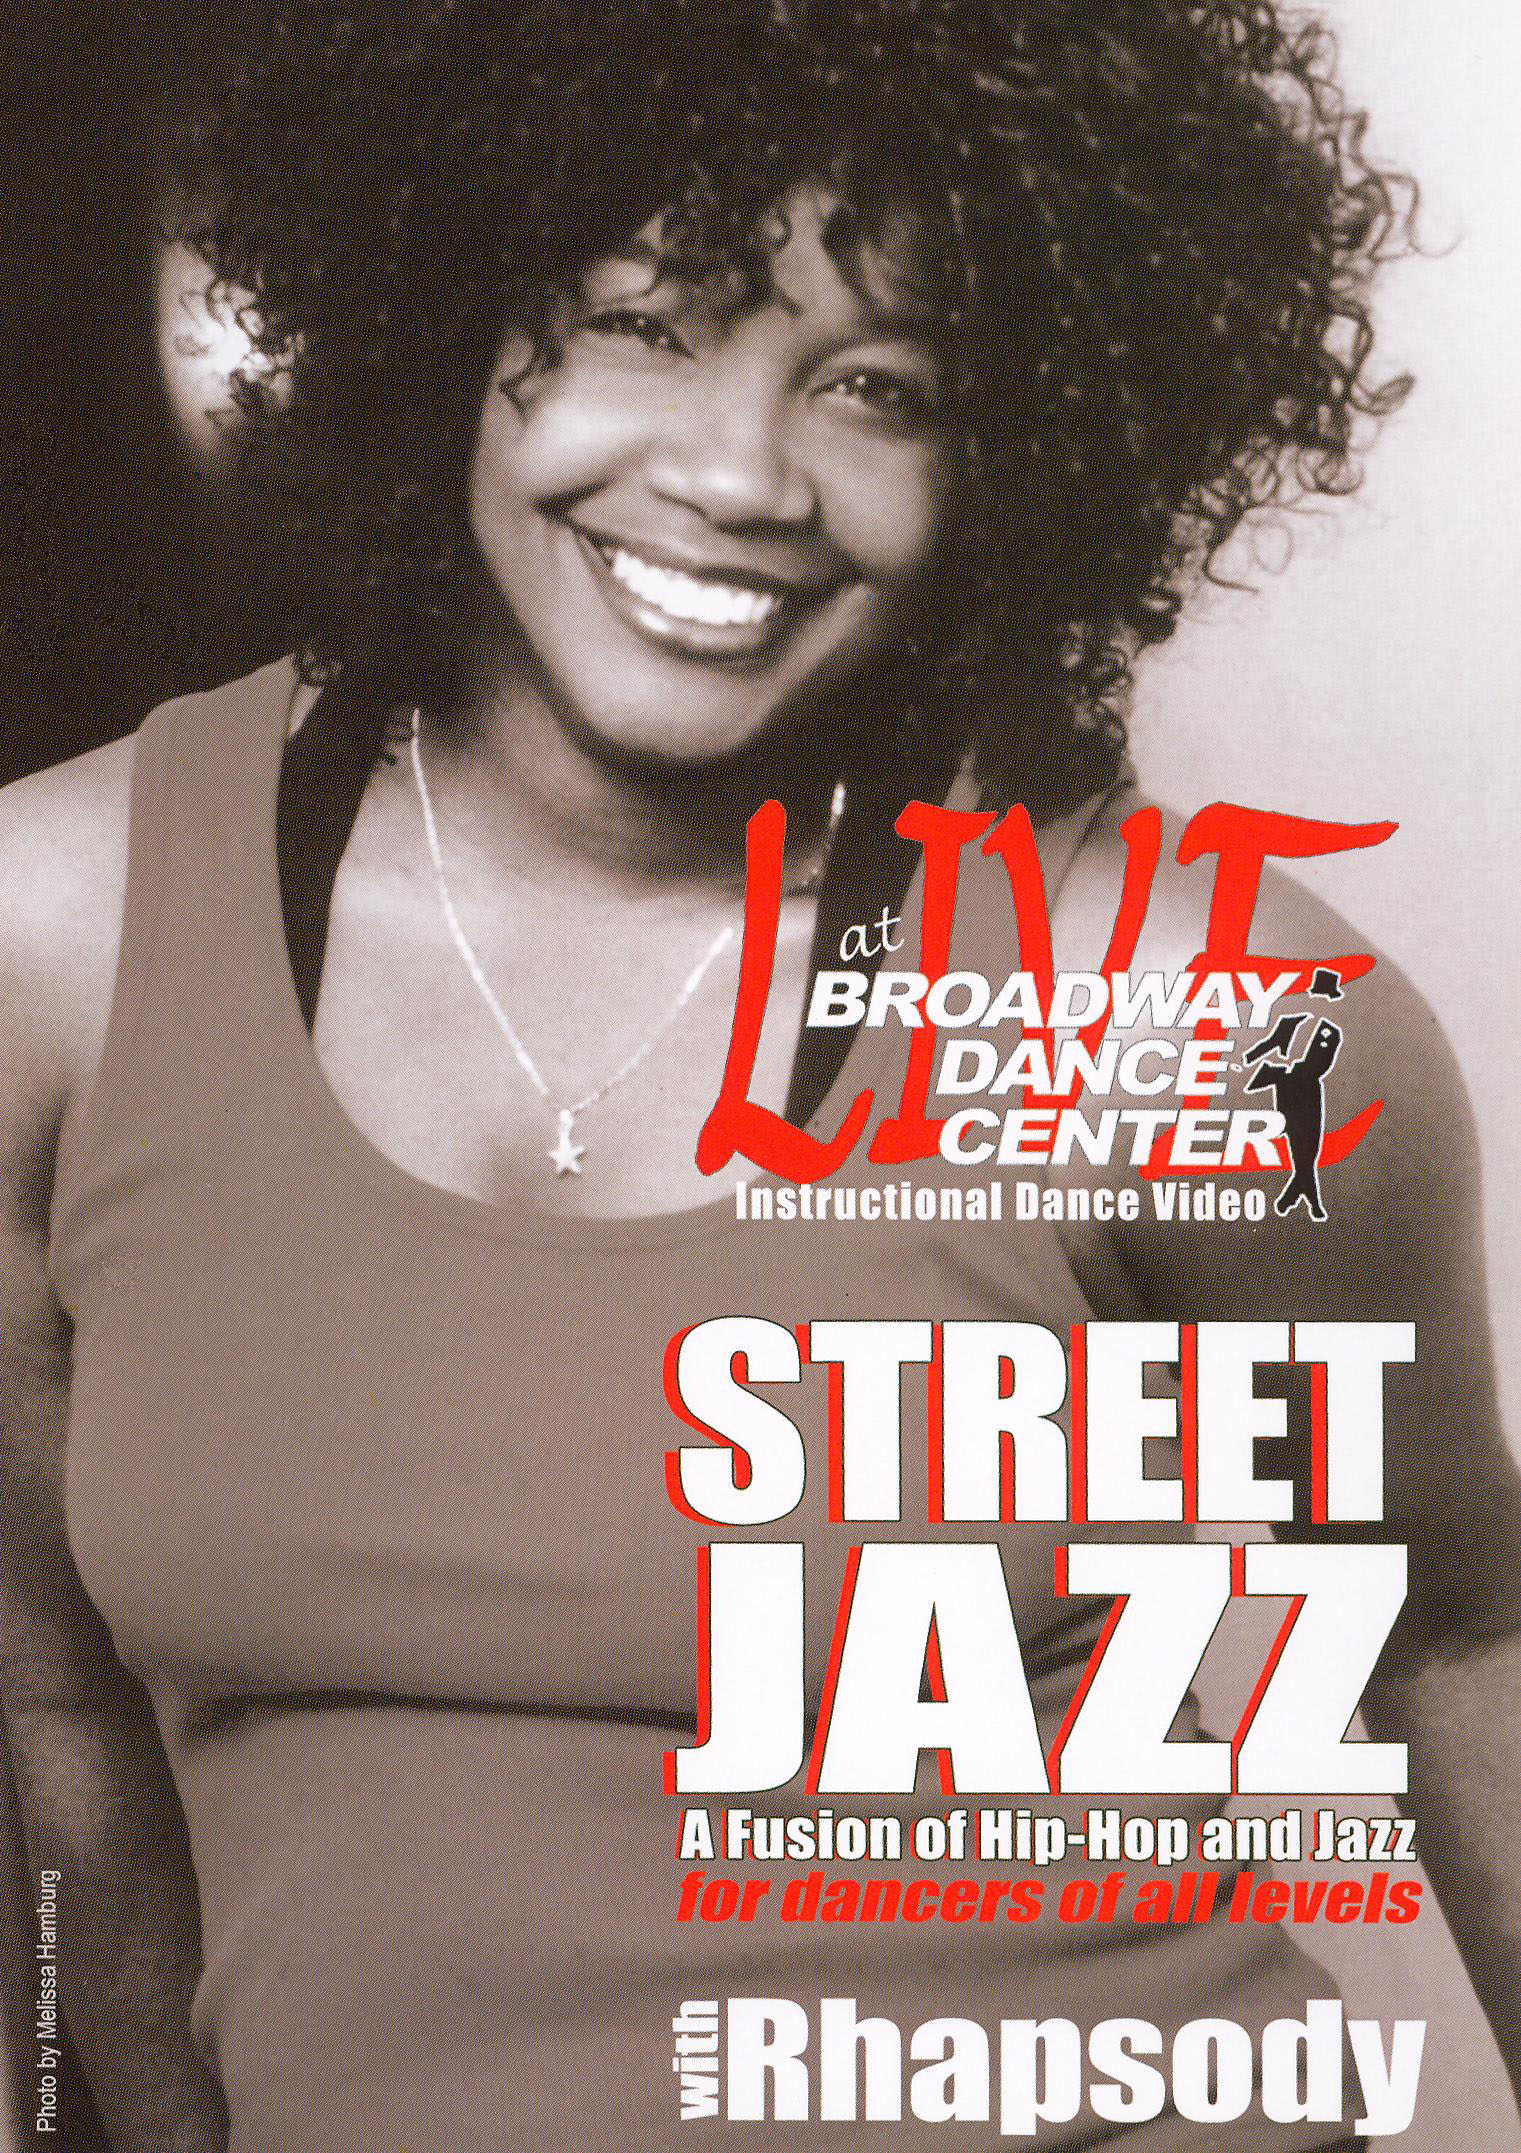 Broadway Dance Center: Street Jazz